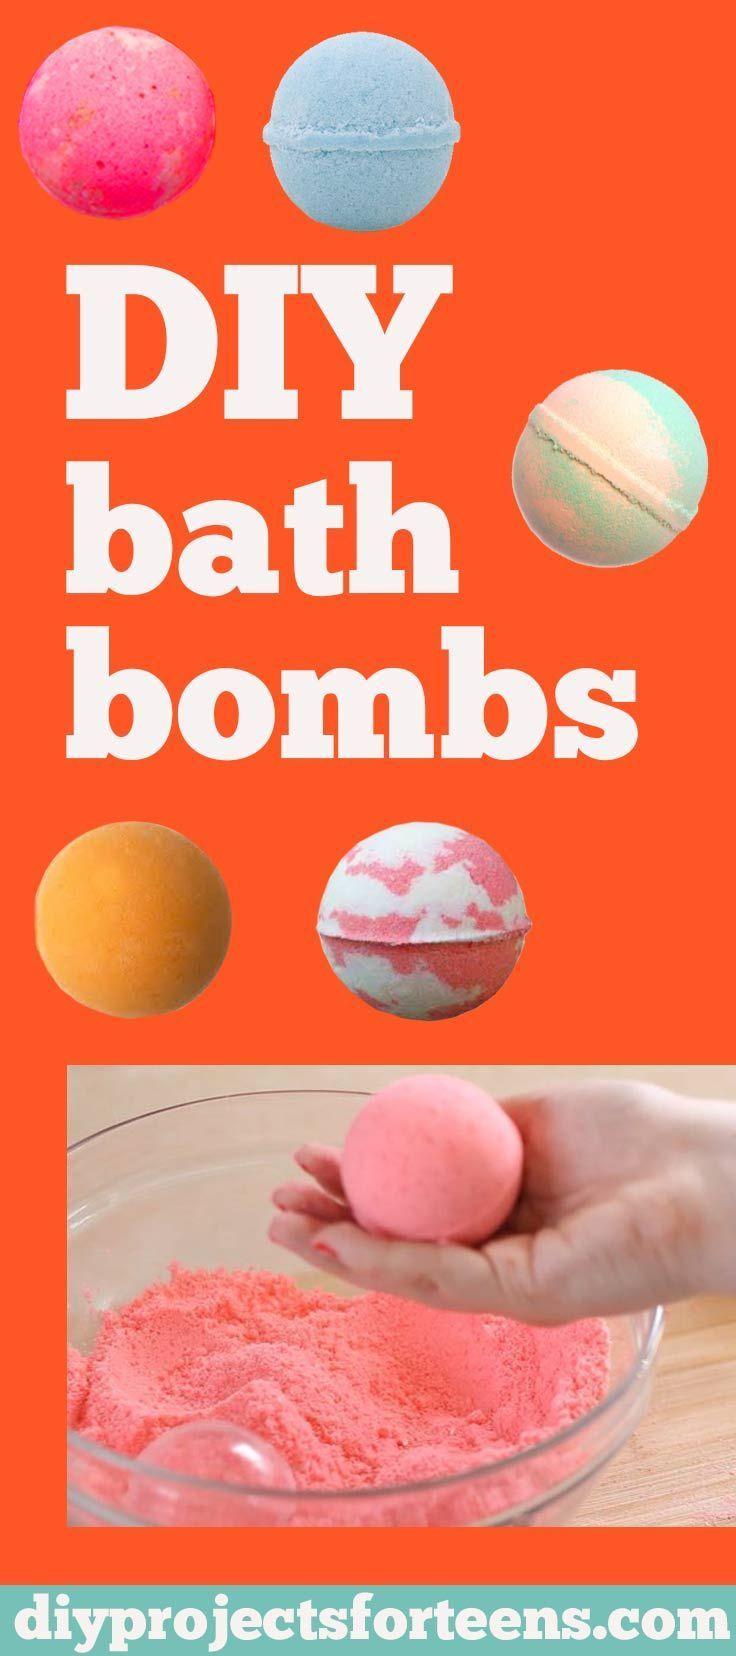 Fun Diy Projects How To Make Diy Lush Bath Bombs Diy Lush Bath Bombs Tutorials